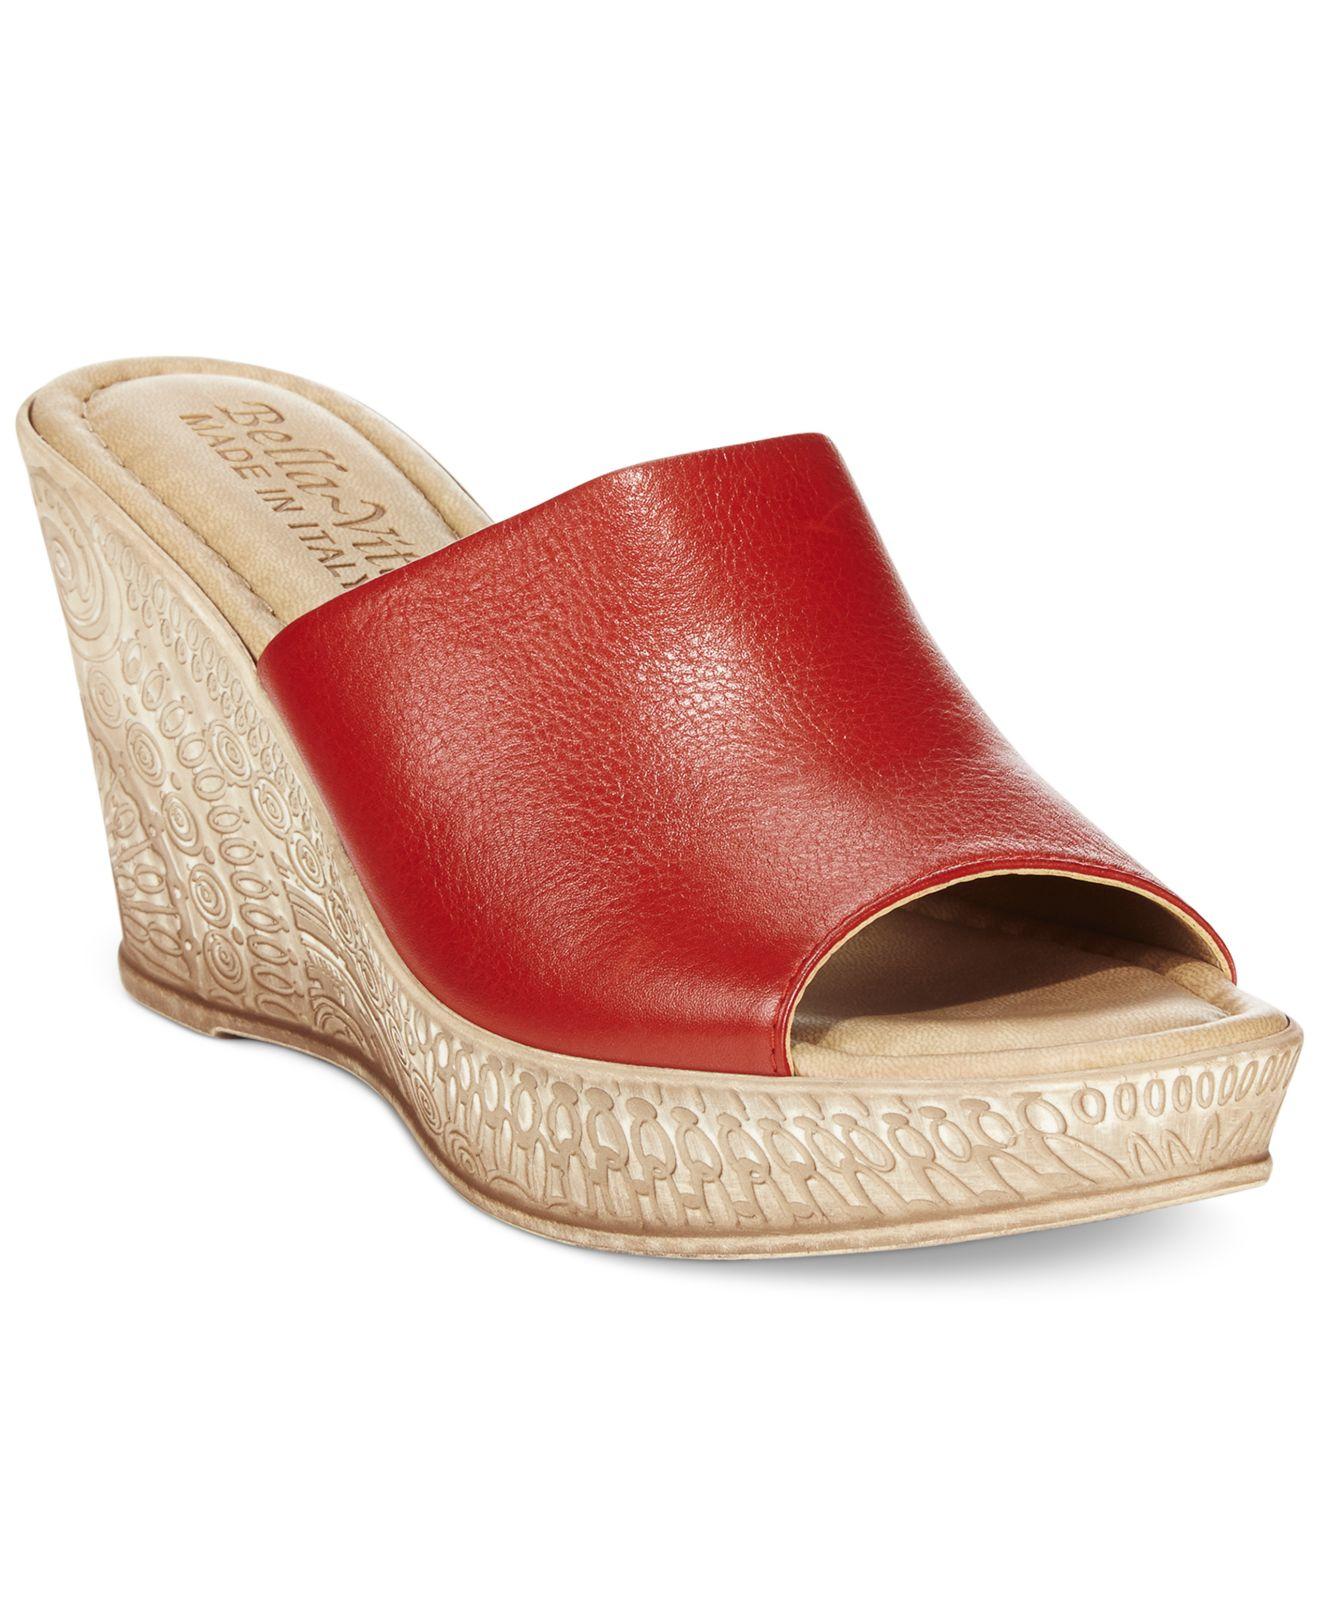 Lyst bella vita mileto wedge mules in red for The bella vita